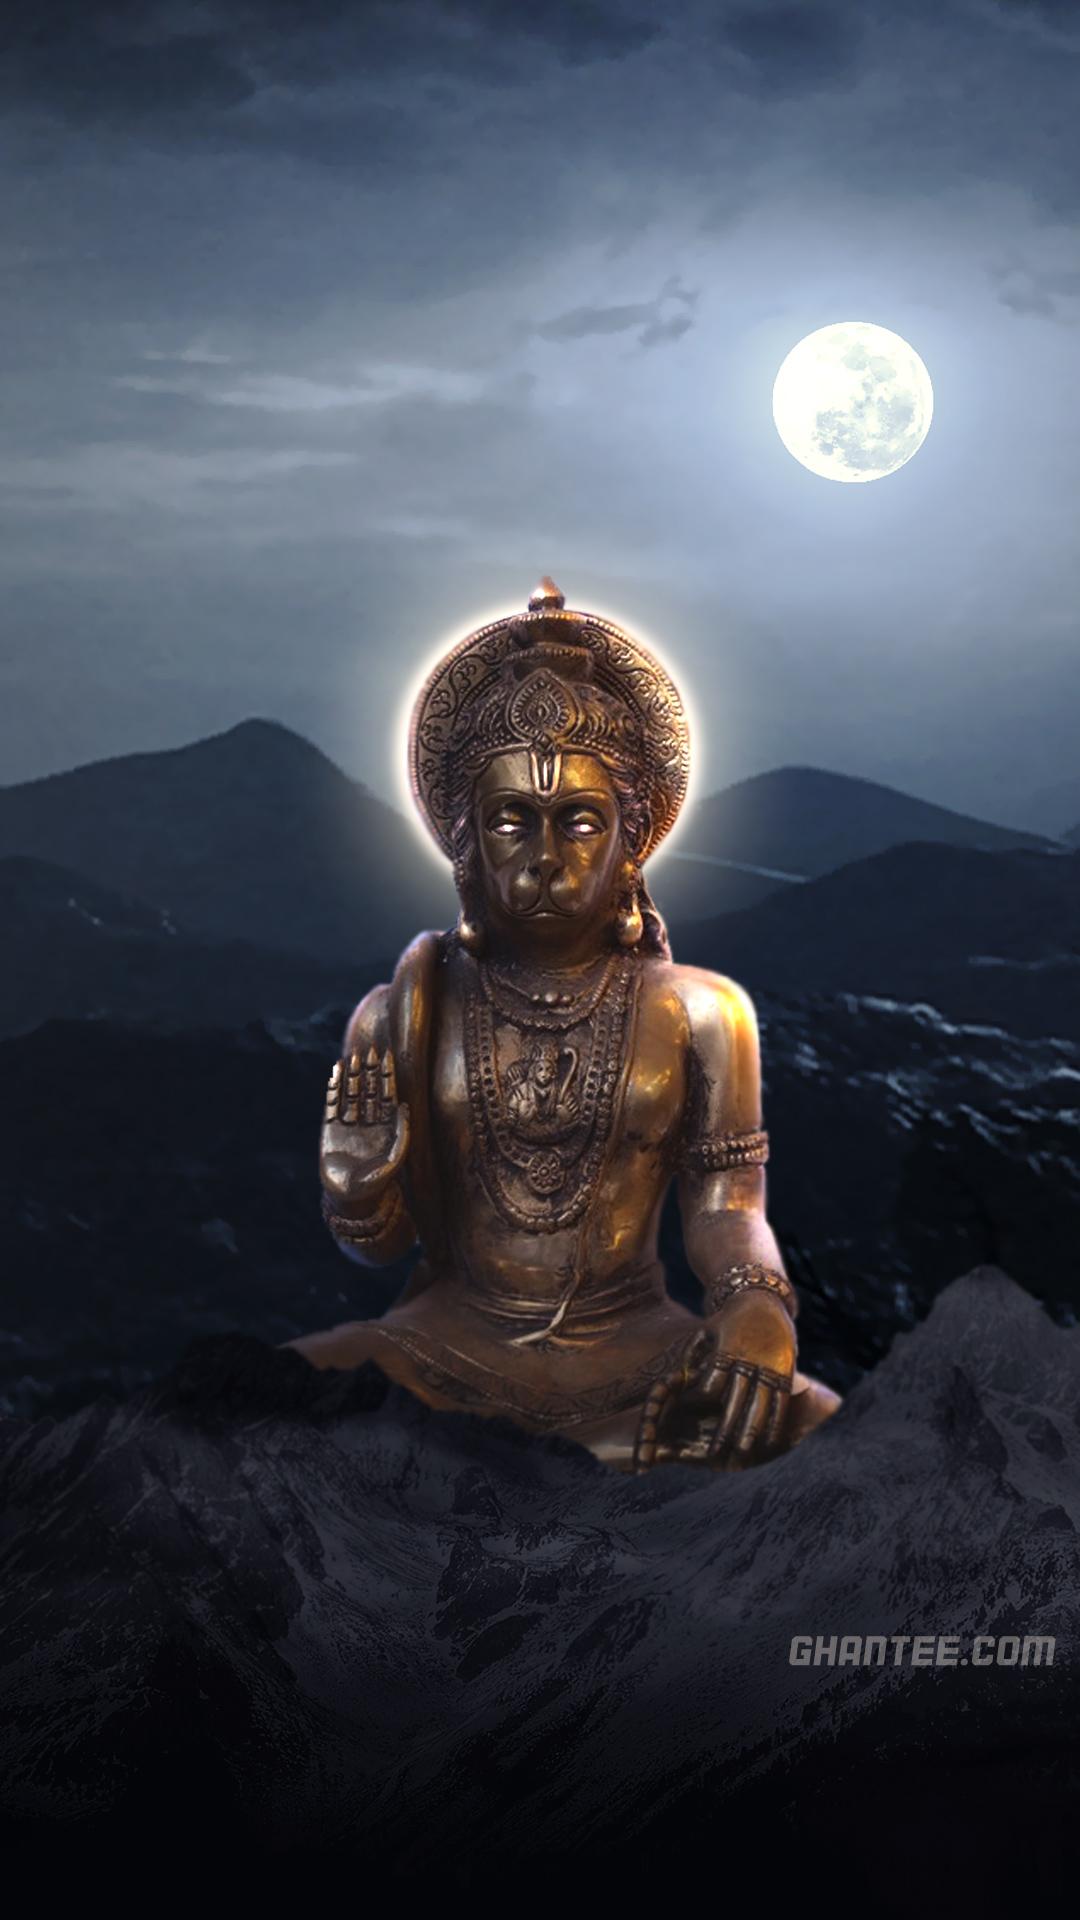 lord hanuman tuesday wallpaper for mobile